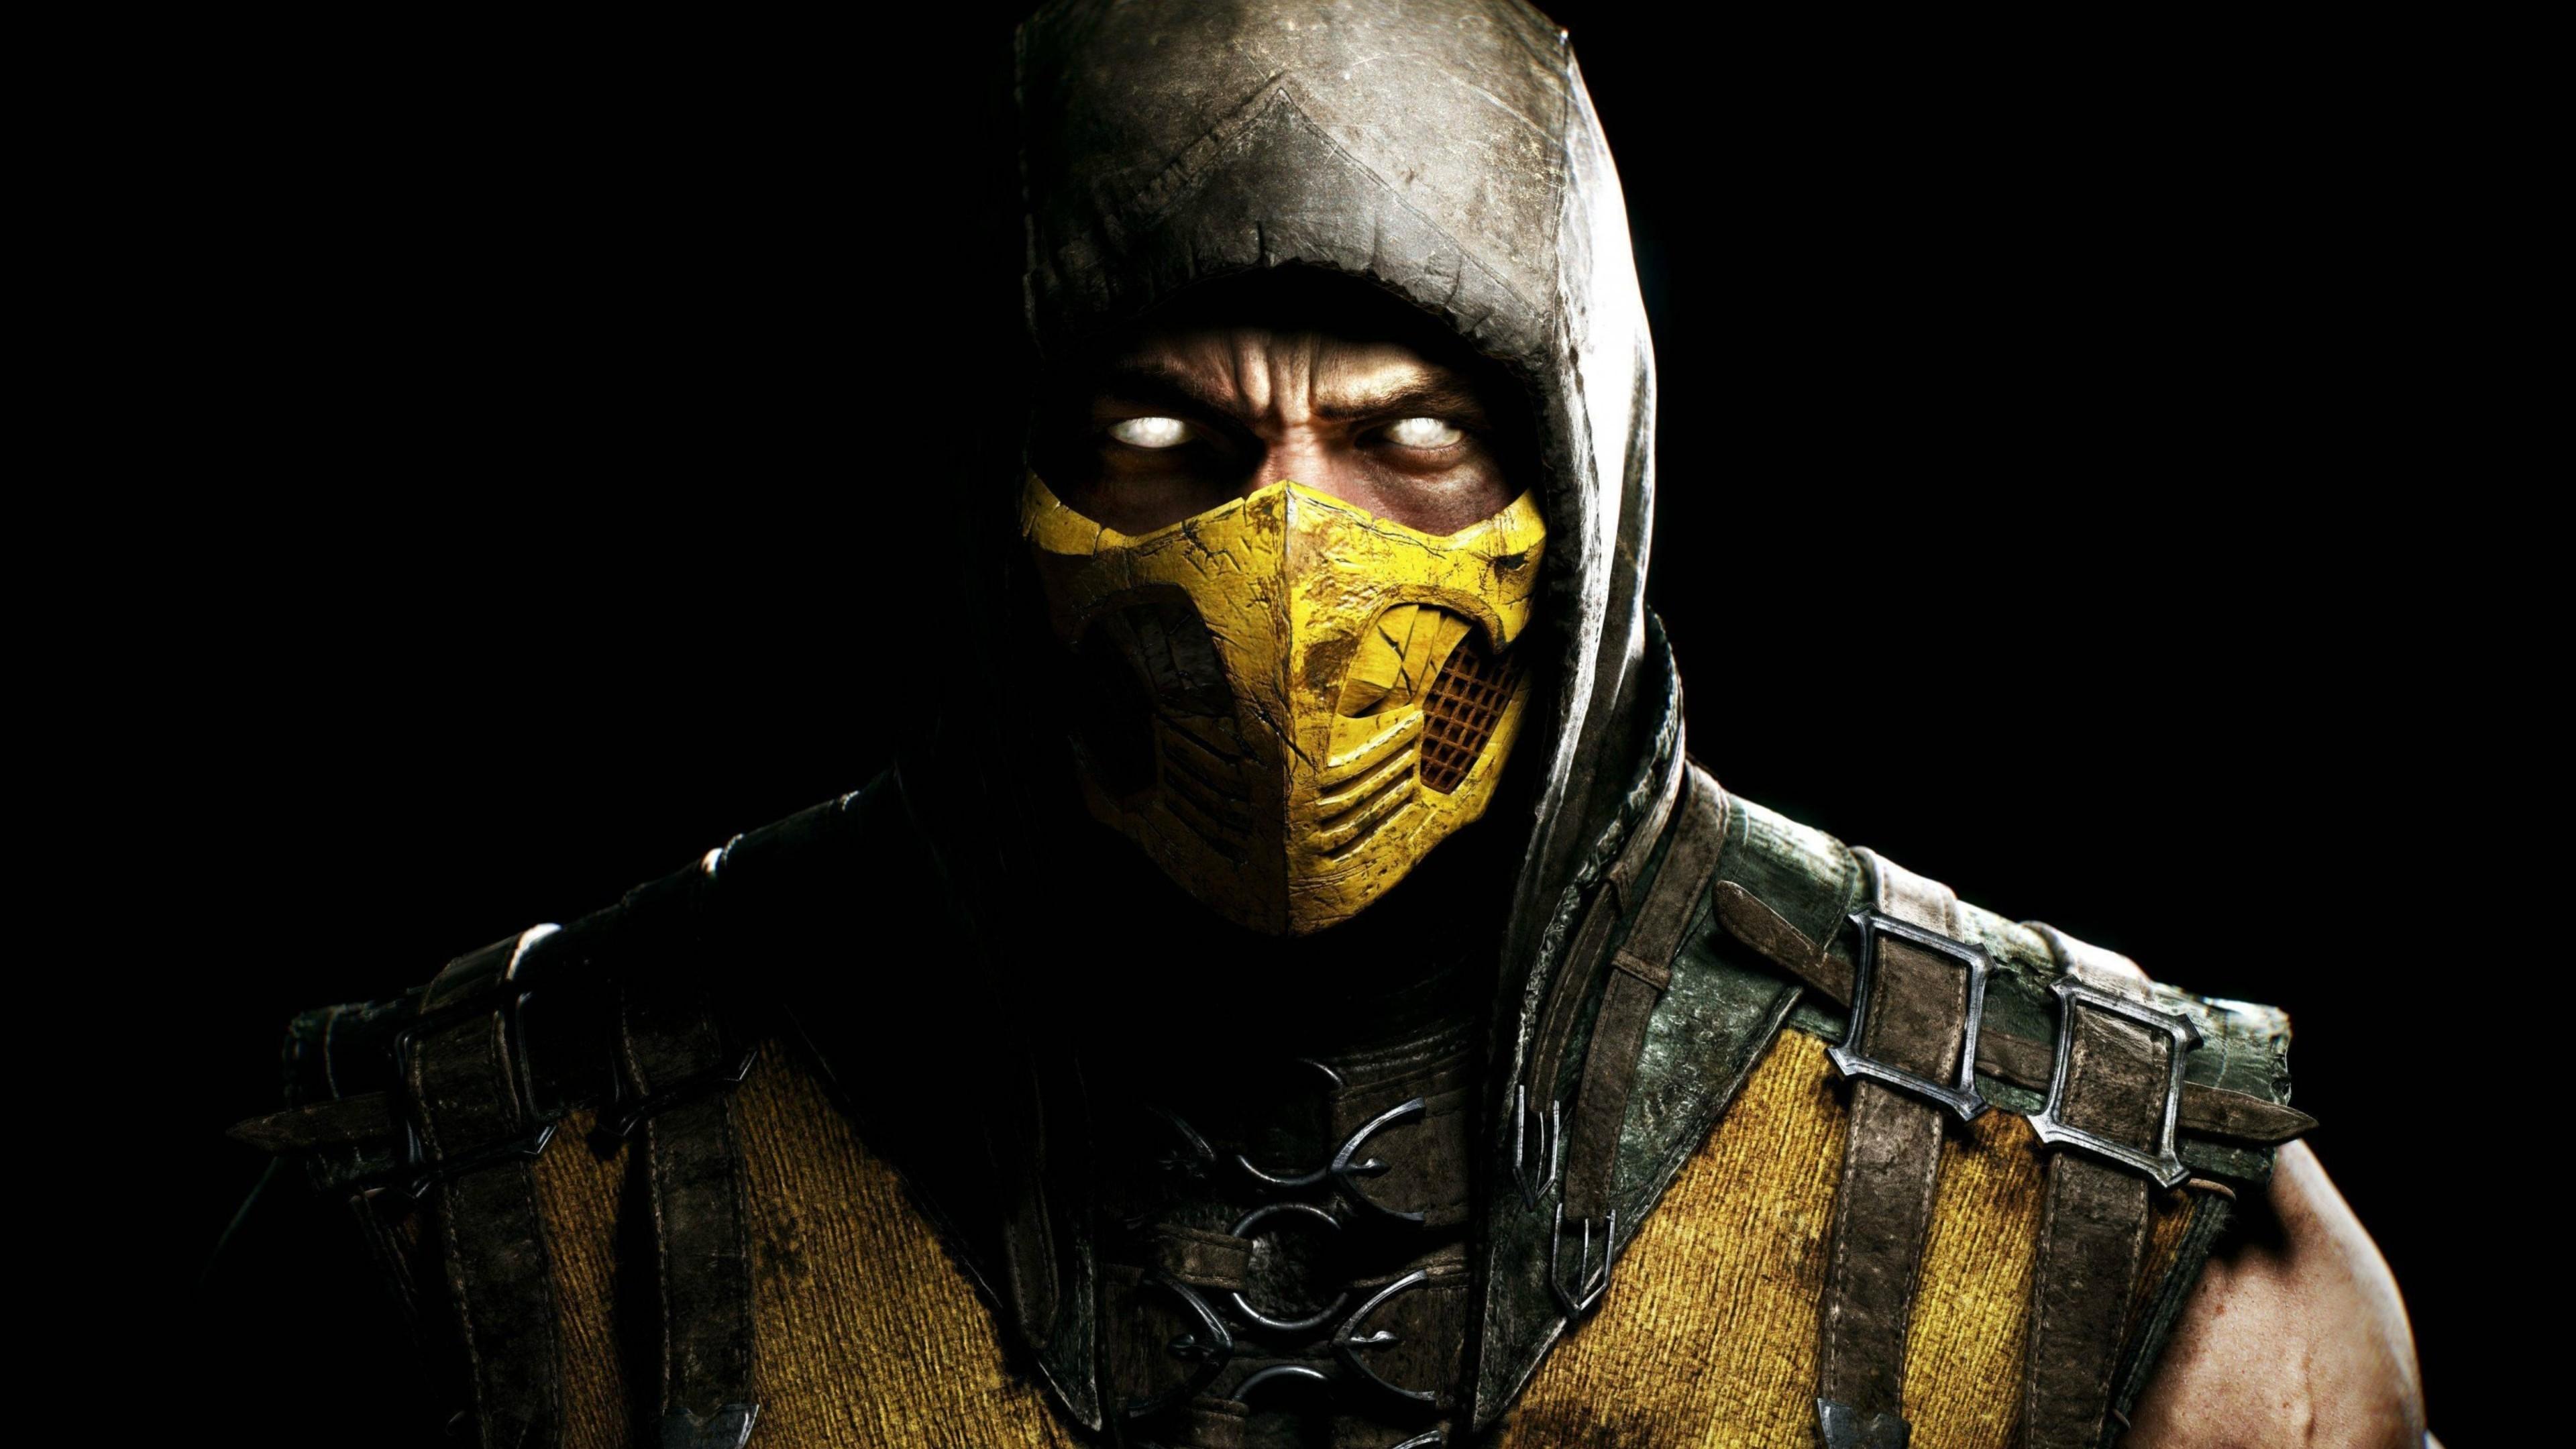 Scorpion In Mortal Kombat Hd Games 4k Wallpapers Images